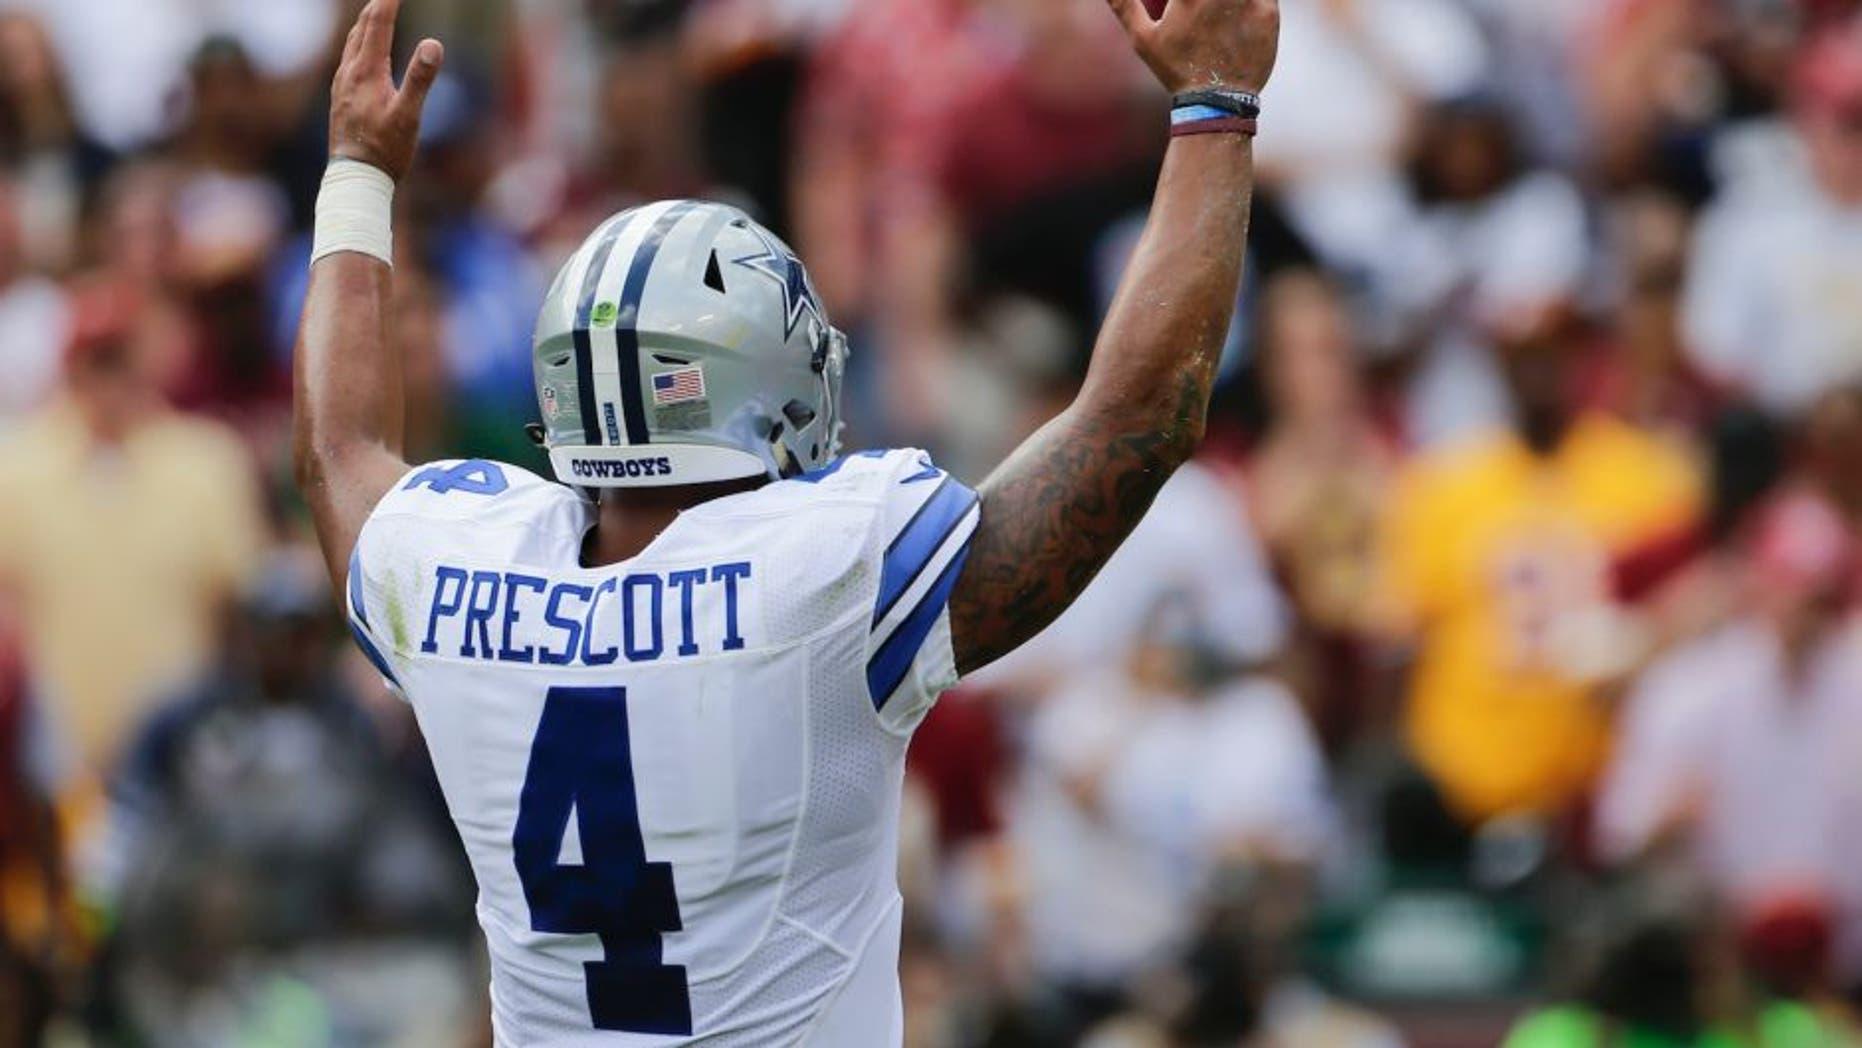 Dallas Cowboys quarterback Dak Prescott (4) celebrates running back Ezekiel Elliott's touchdown during the first half of an NFL football game against the Washington Redskins in Landover, Md., Sunday, Sept. 18, 2016. (AP Photo/Mark Tenally)